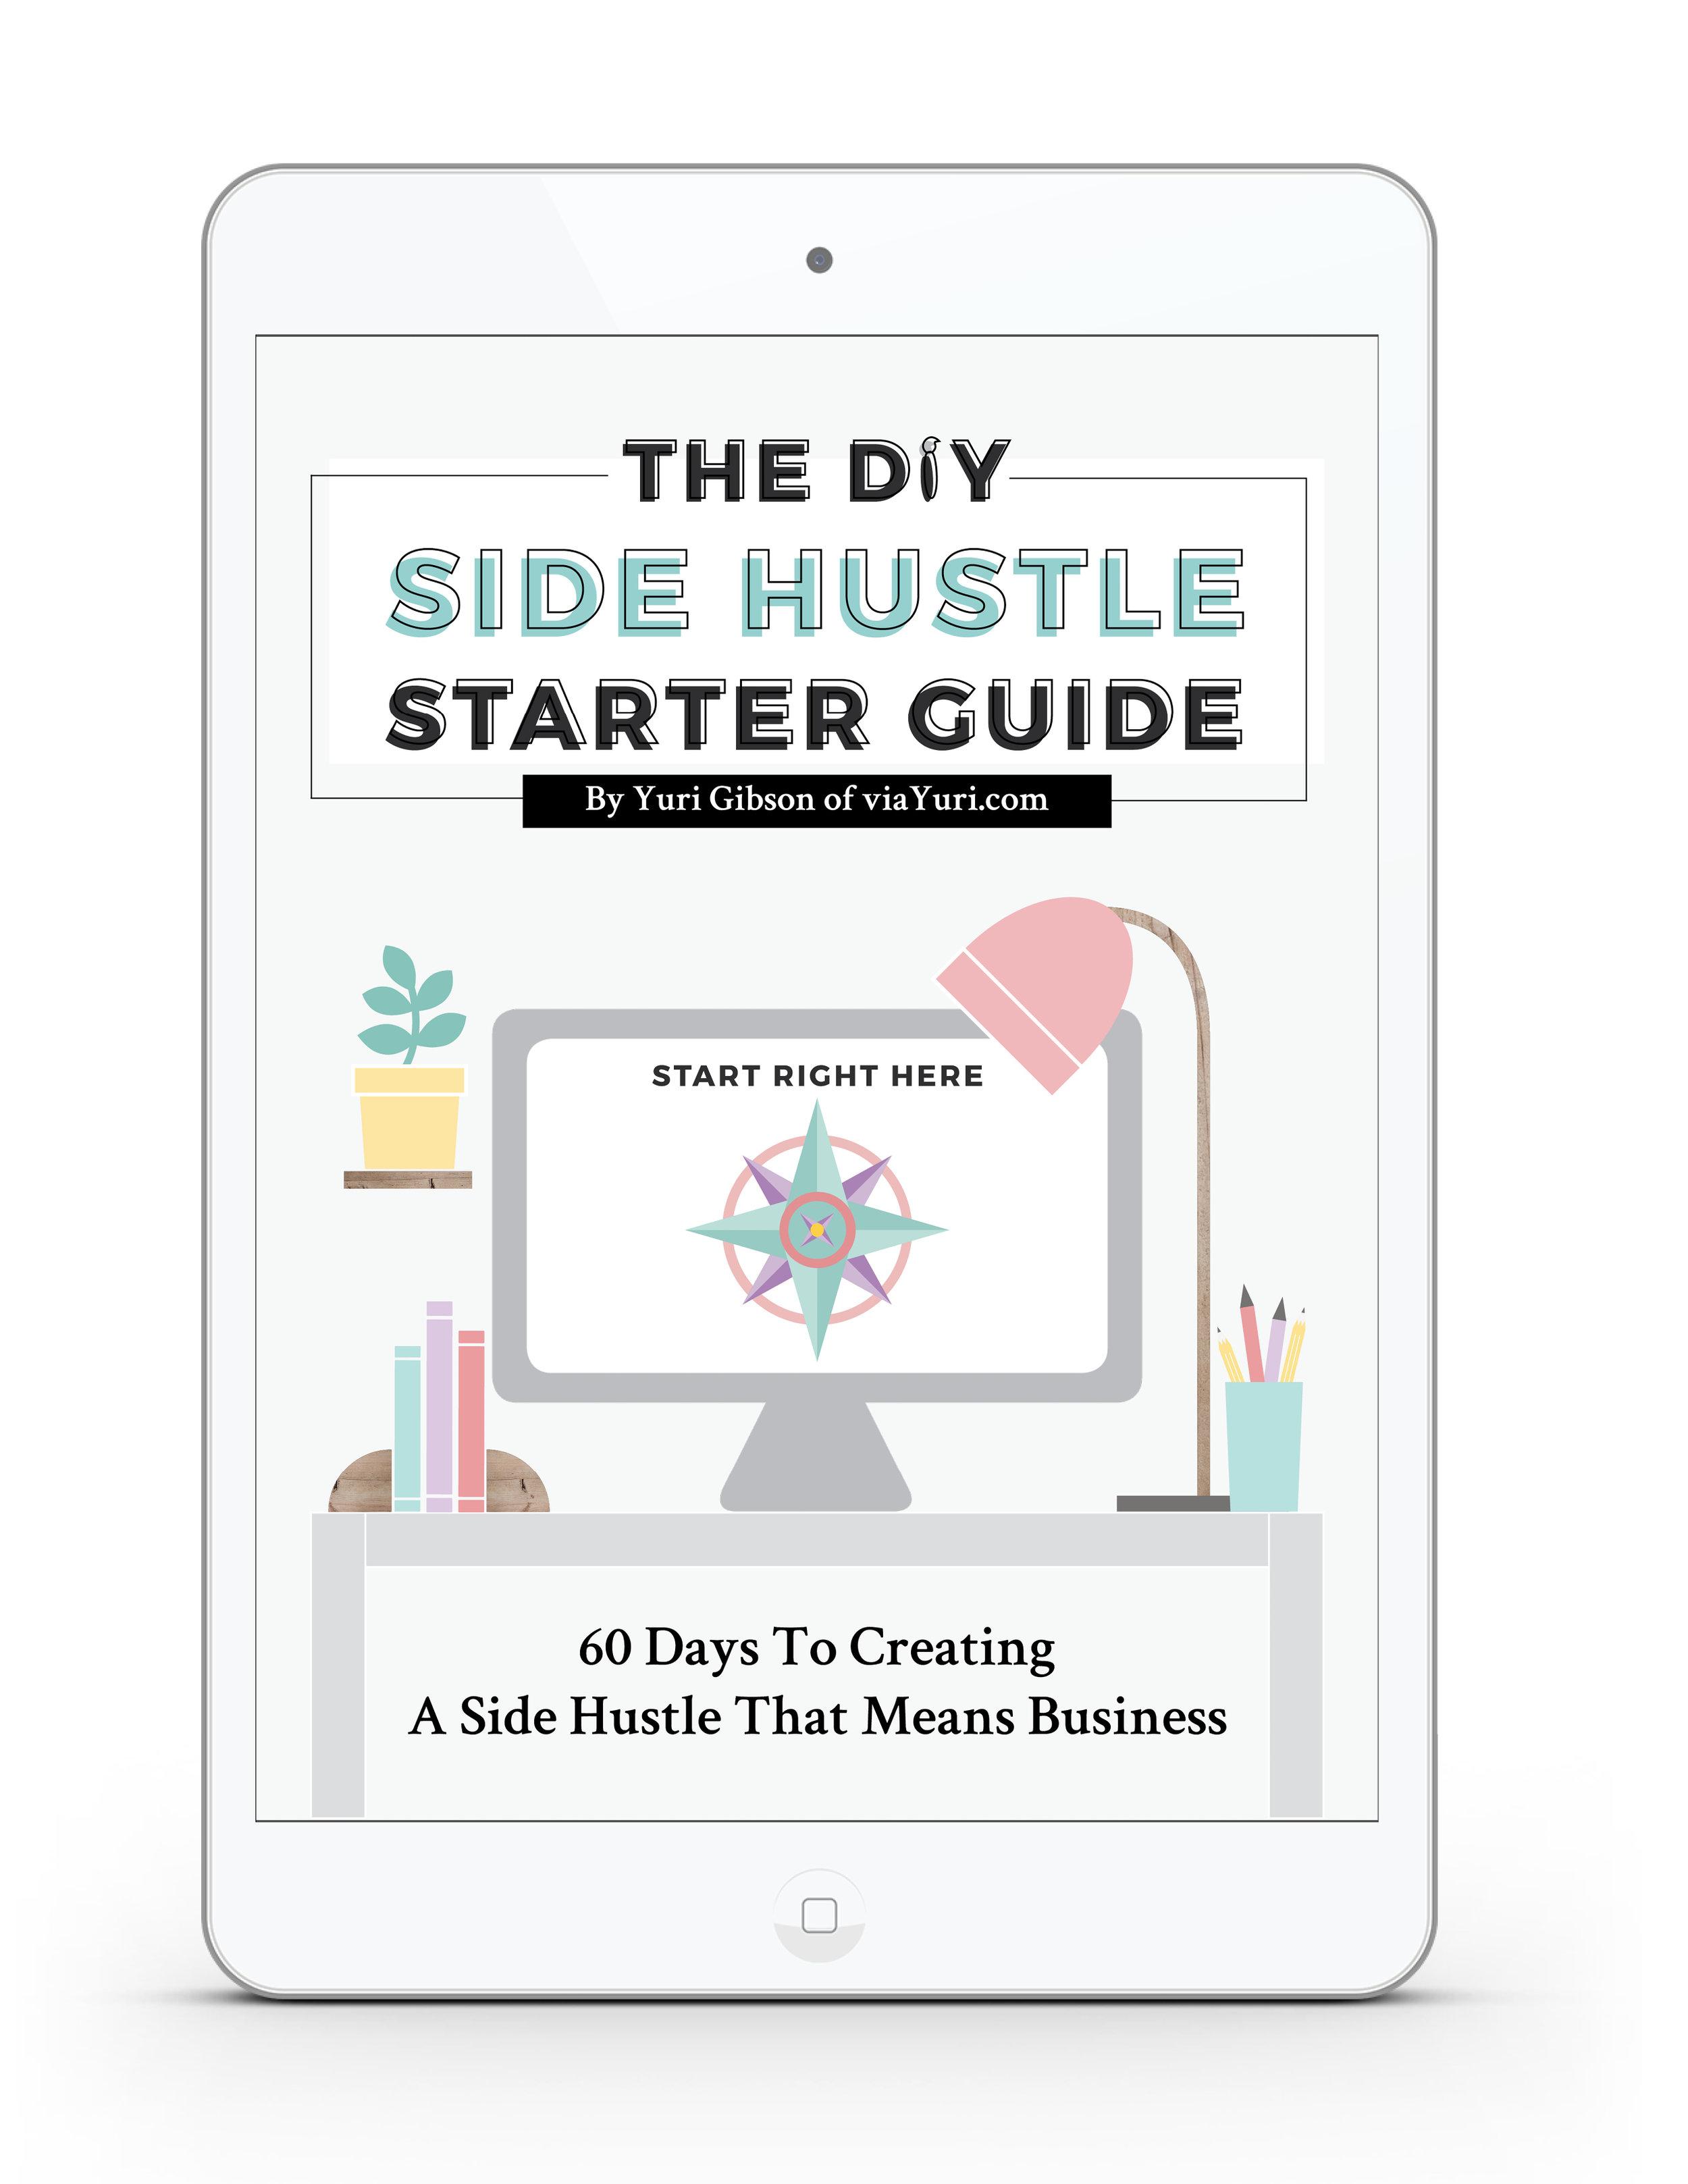 ipad-mockup-DIY-Starter-Guide.jpg